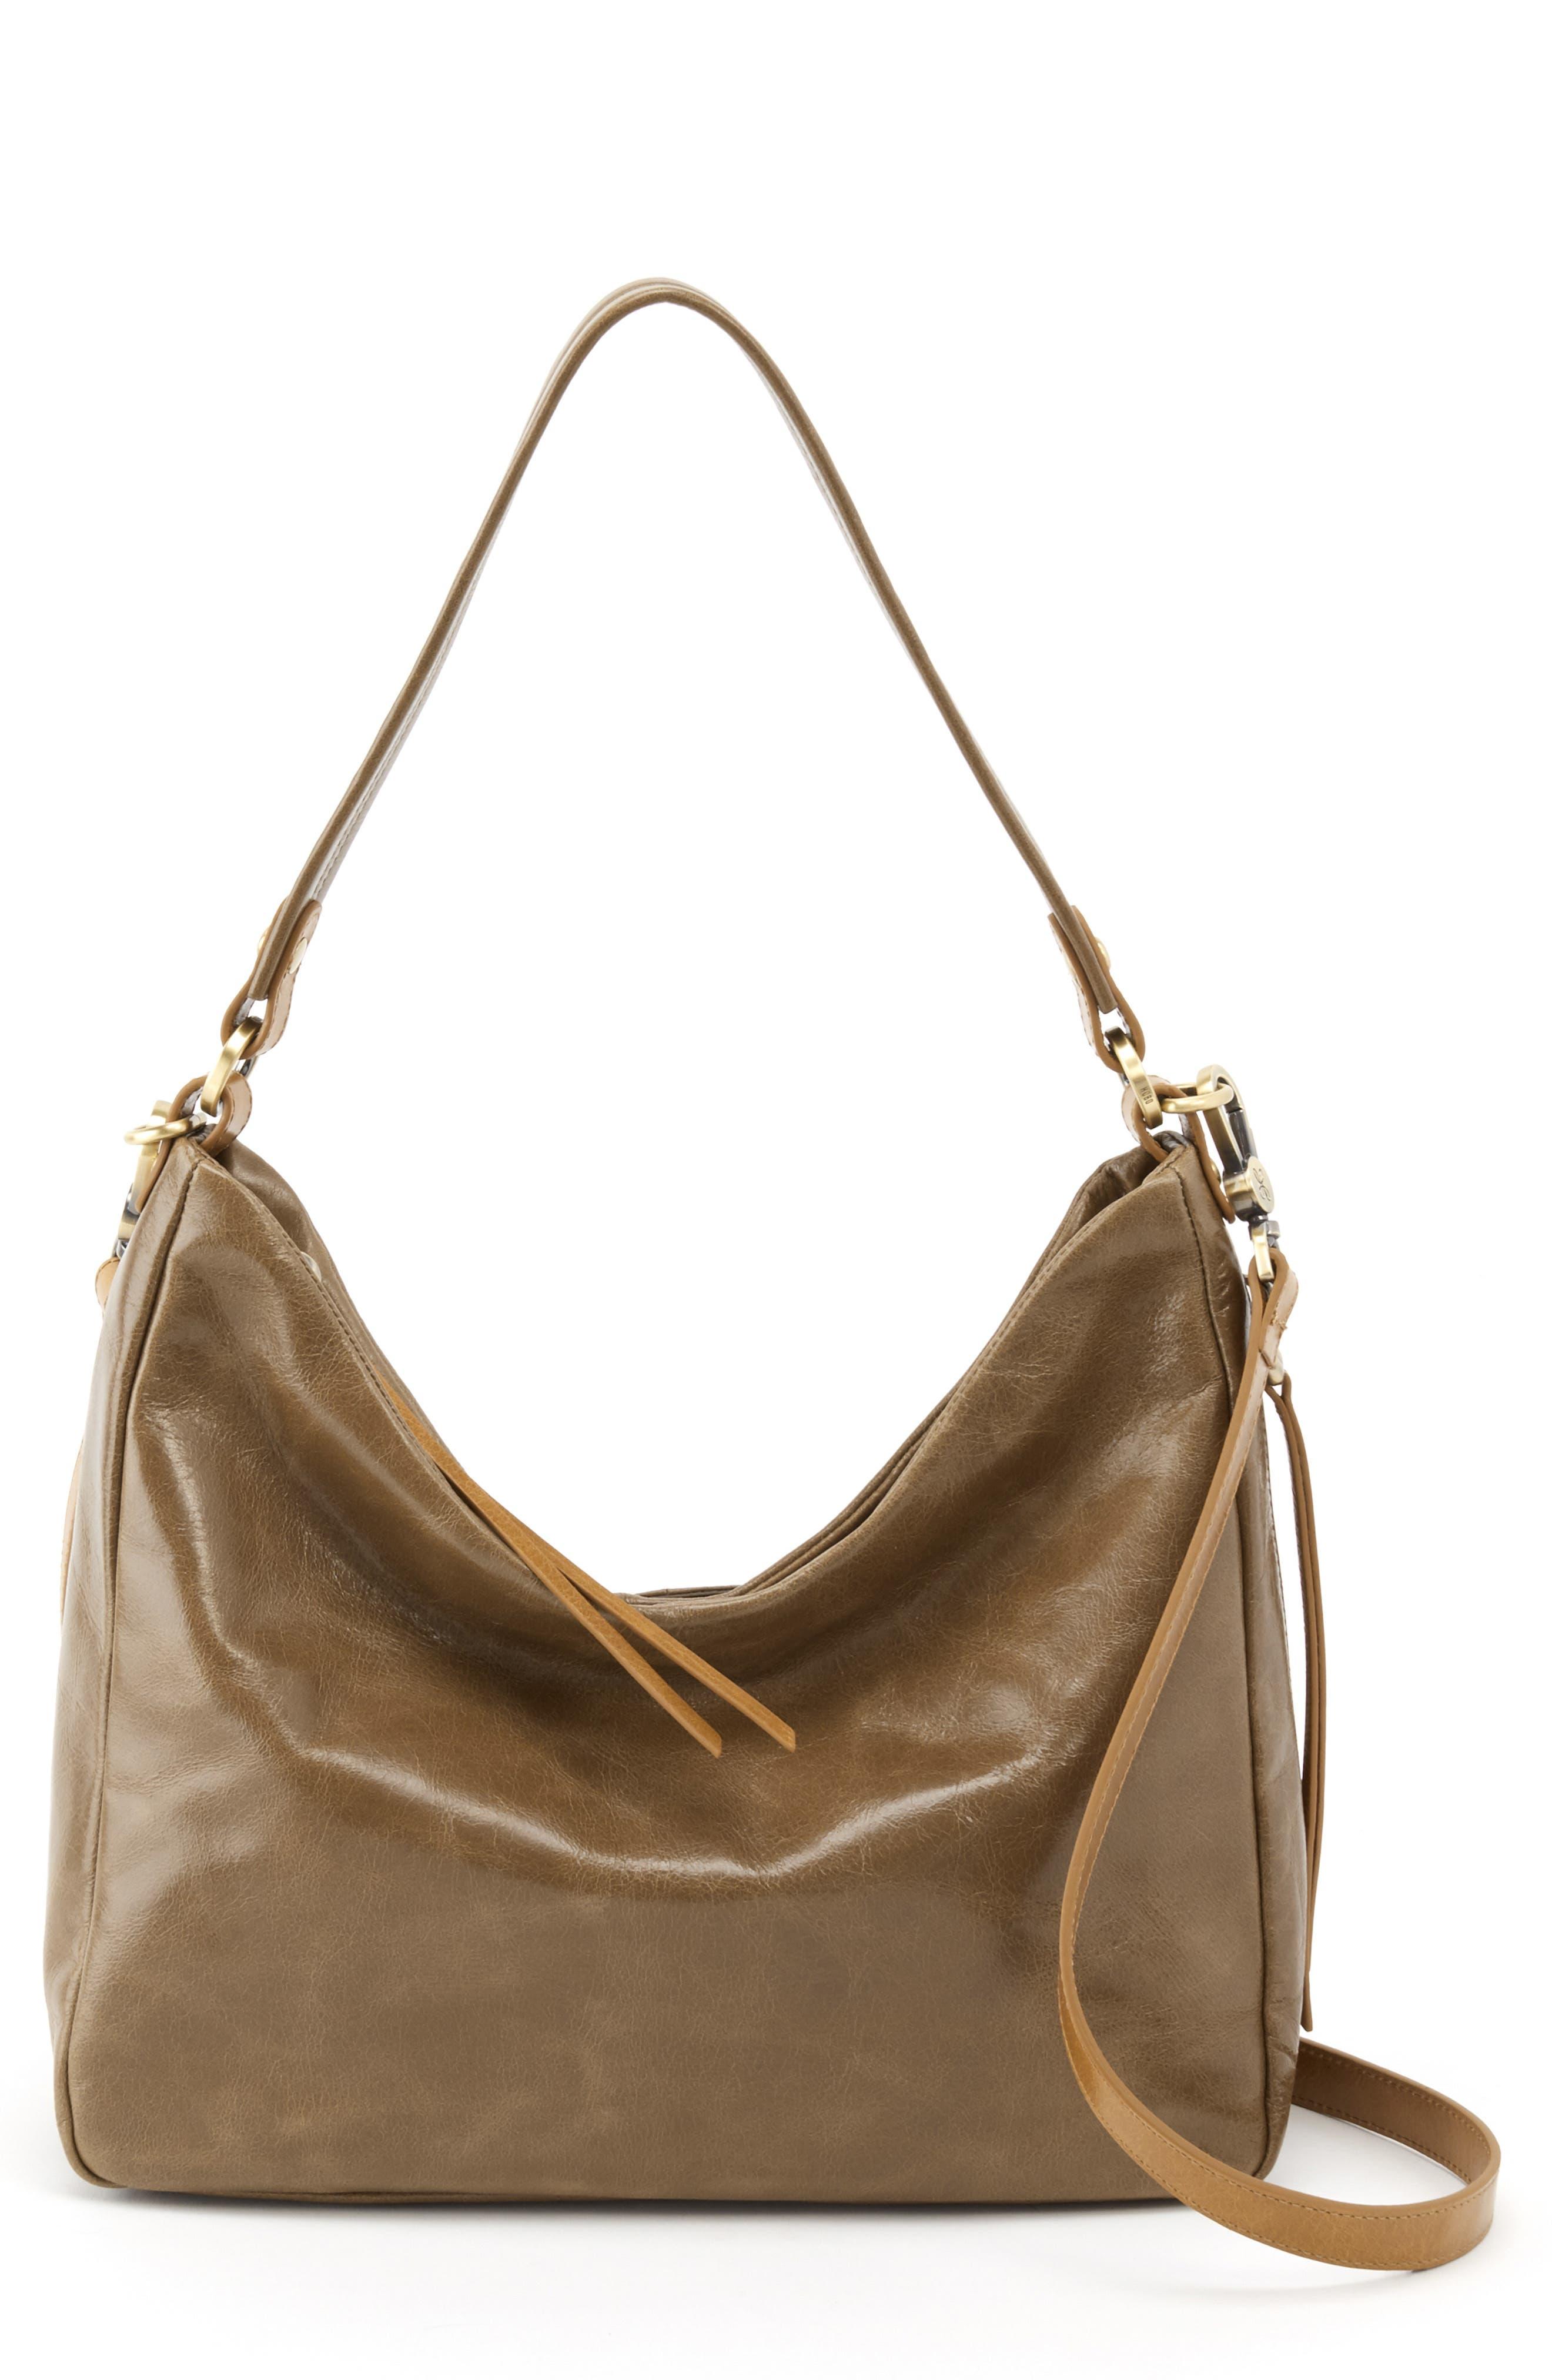 Hobo Delilah Convertible Hobo Bag